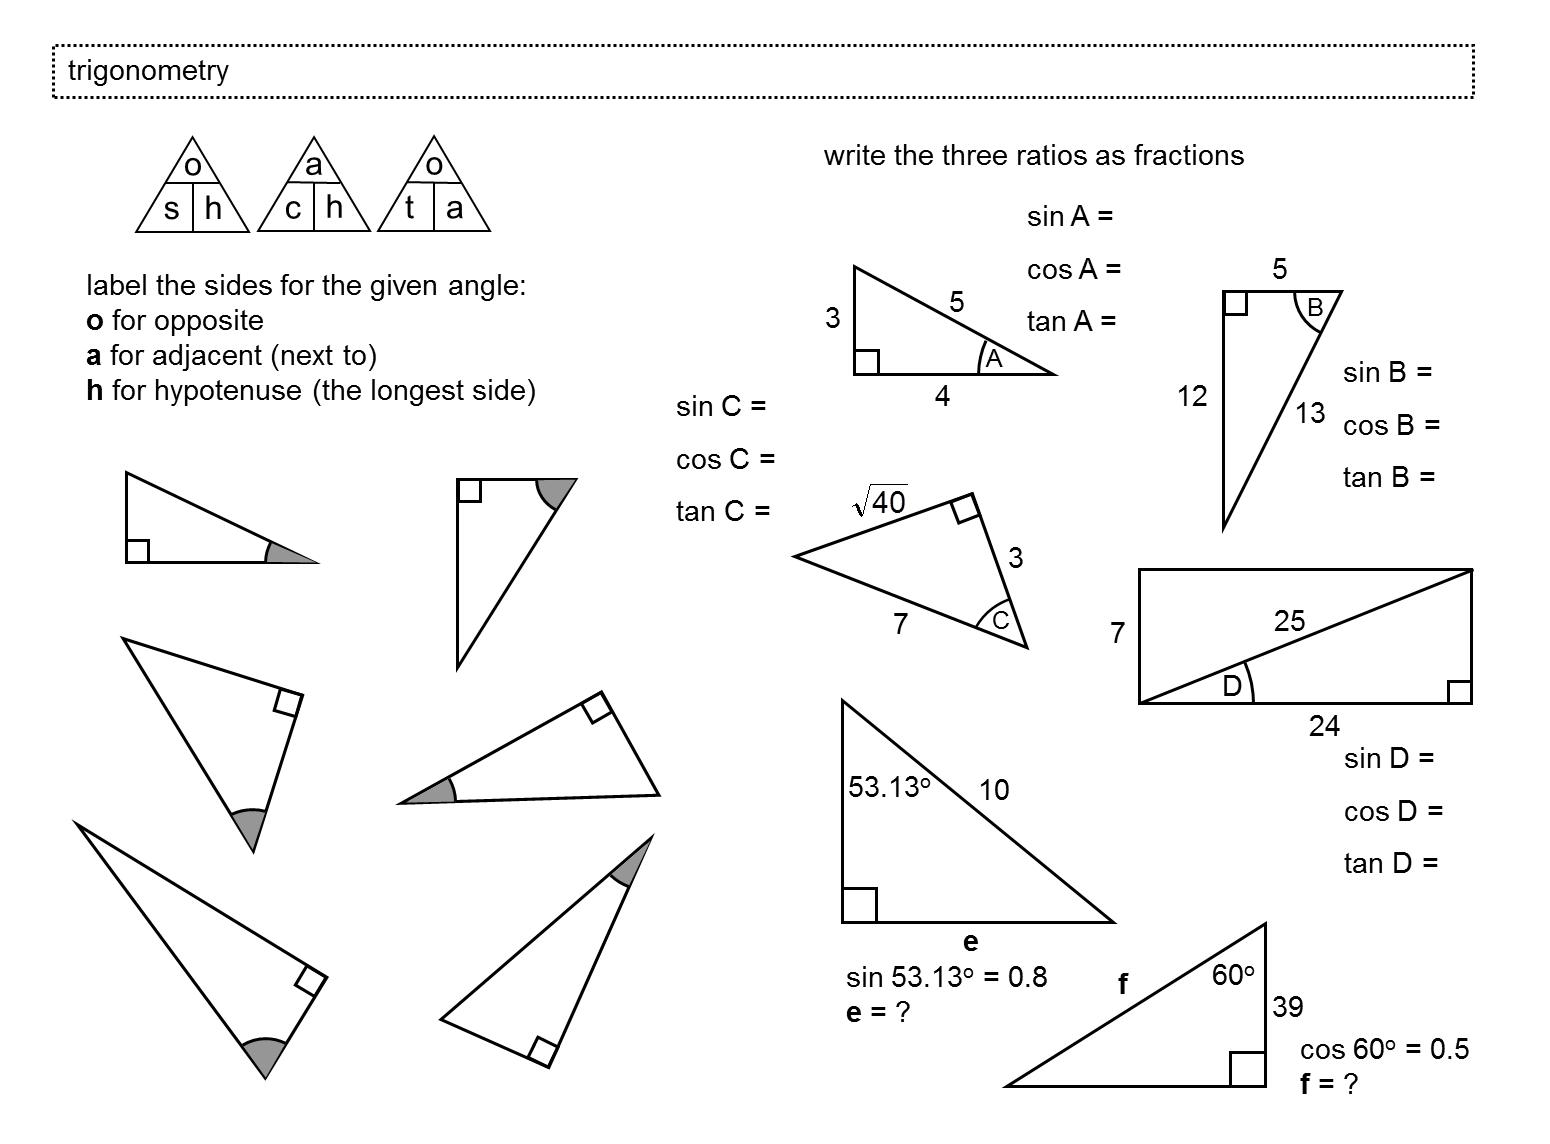 Worksheet  Trigonometry Worksheets  Hate Mysql Worksheet For Everyone